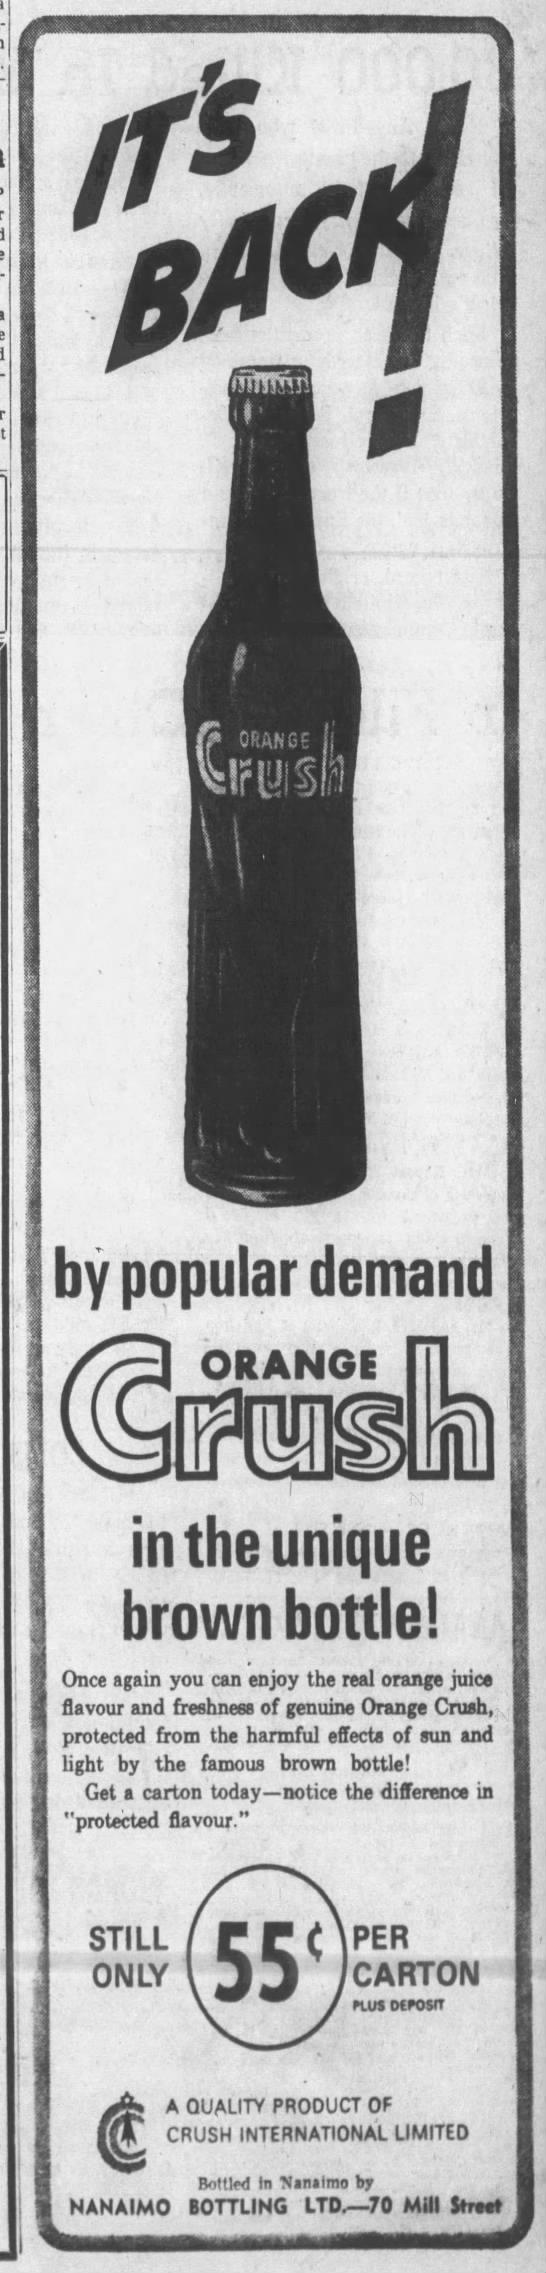 Orange Crush-back in the brown bottle-Nanaimo Daily News, 21 Jun 1965, Mon, Page 3.jpg